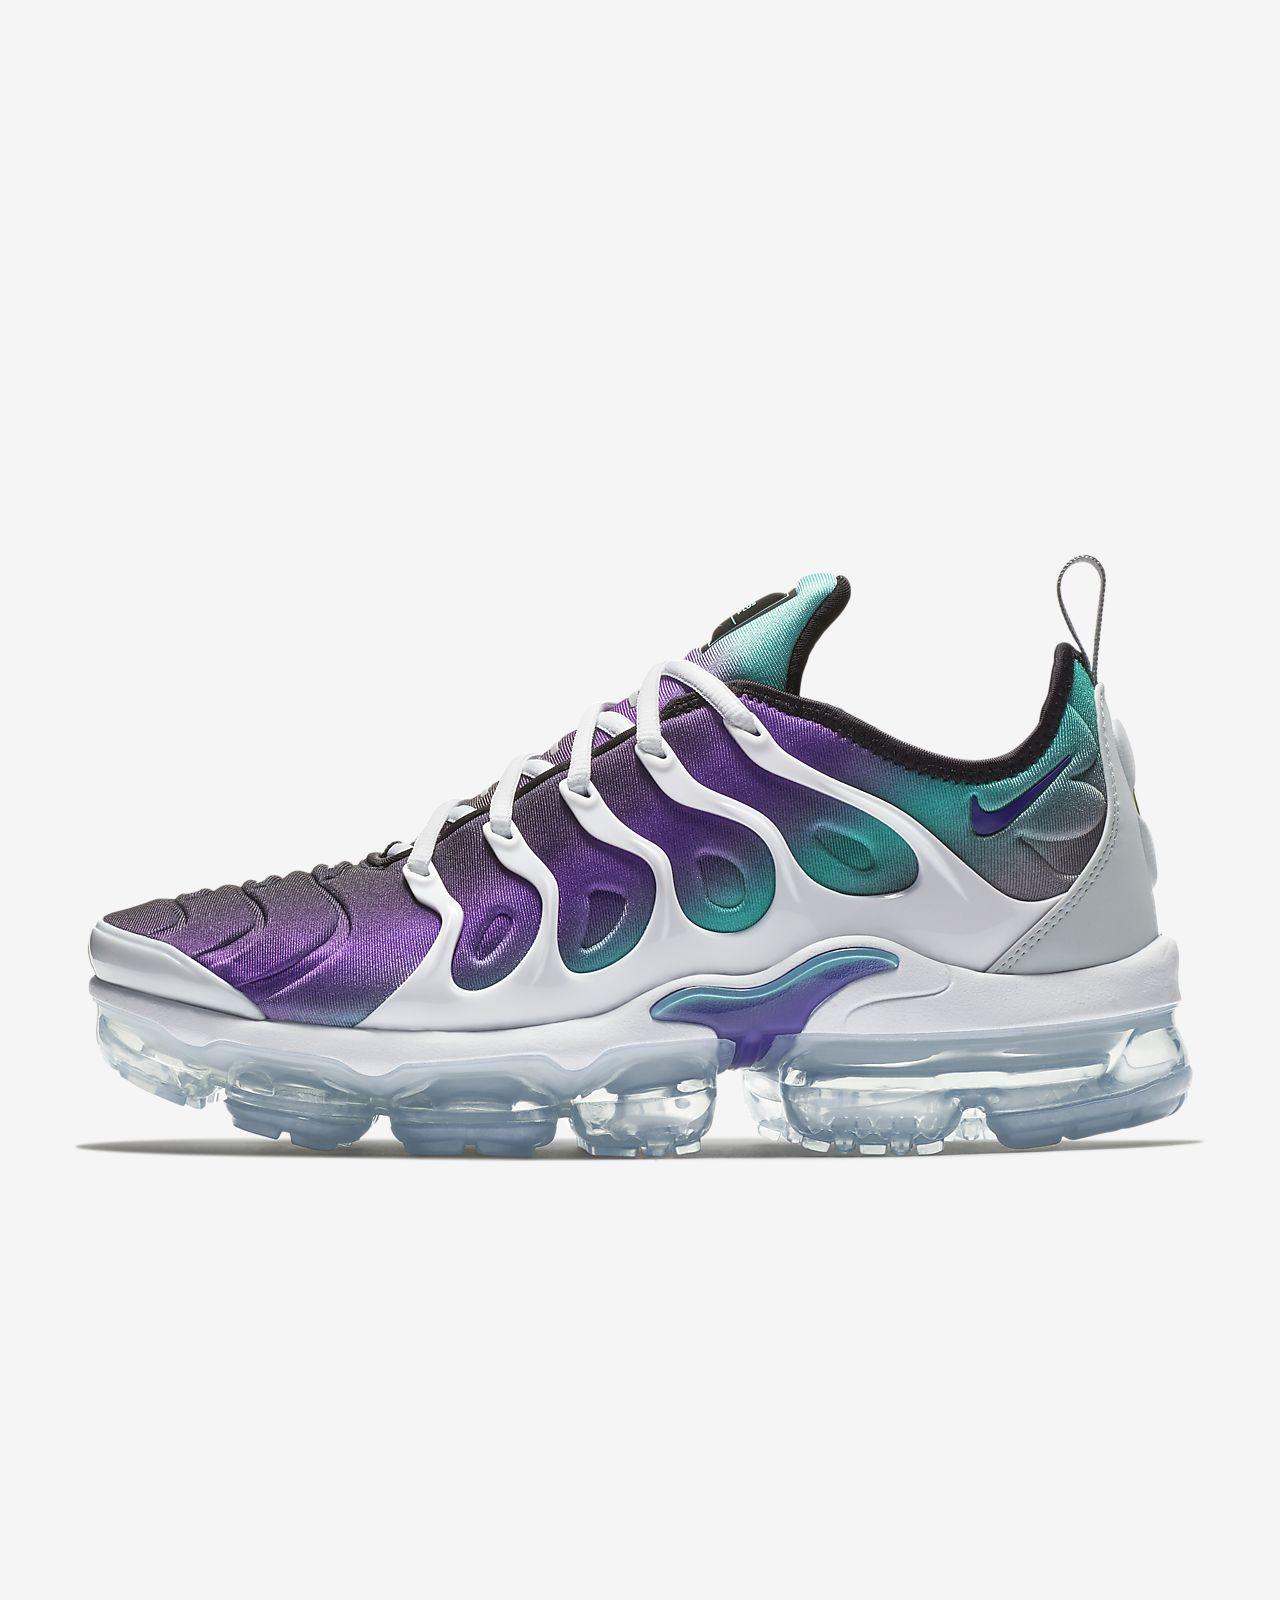 Men's Shoe. Nike Air VaporMax Plus